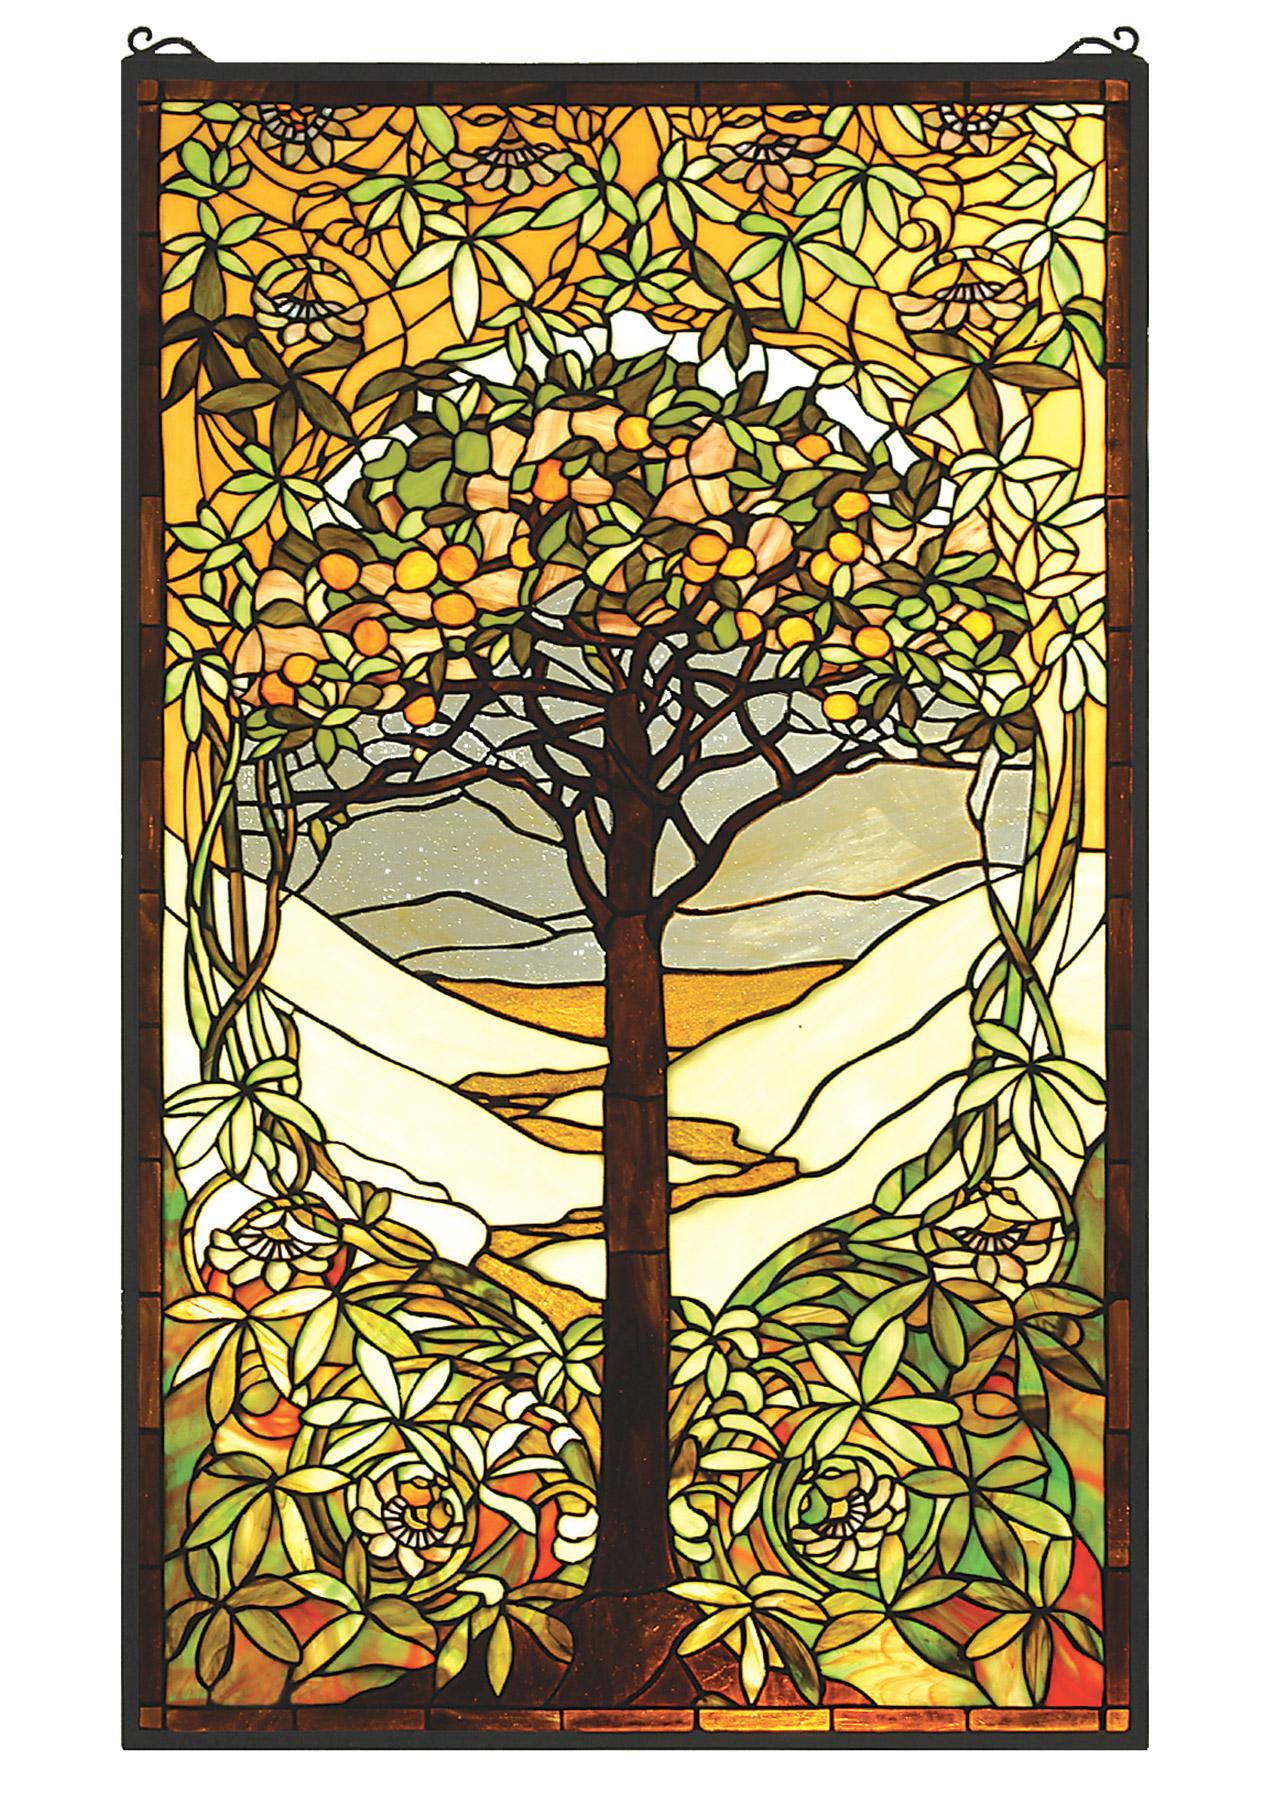 Meyda 66668 tiffany tree of life stained glass window for Art glass windows